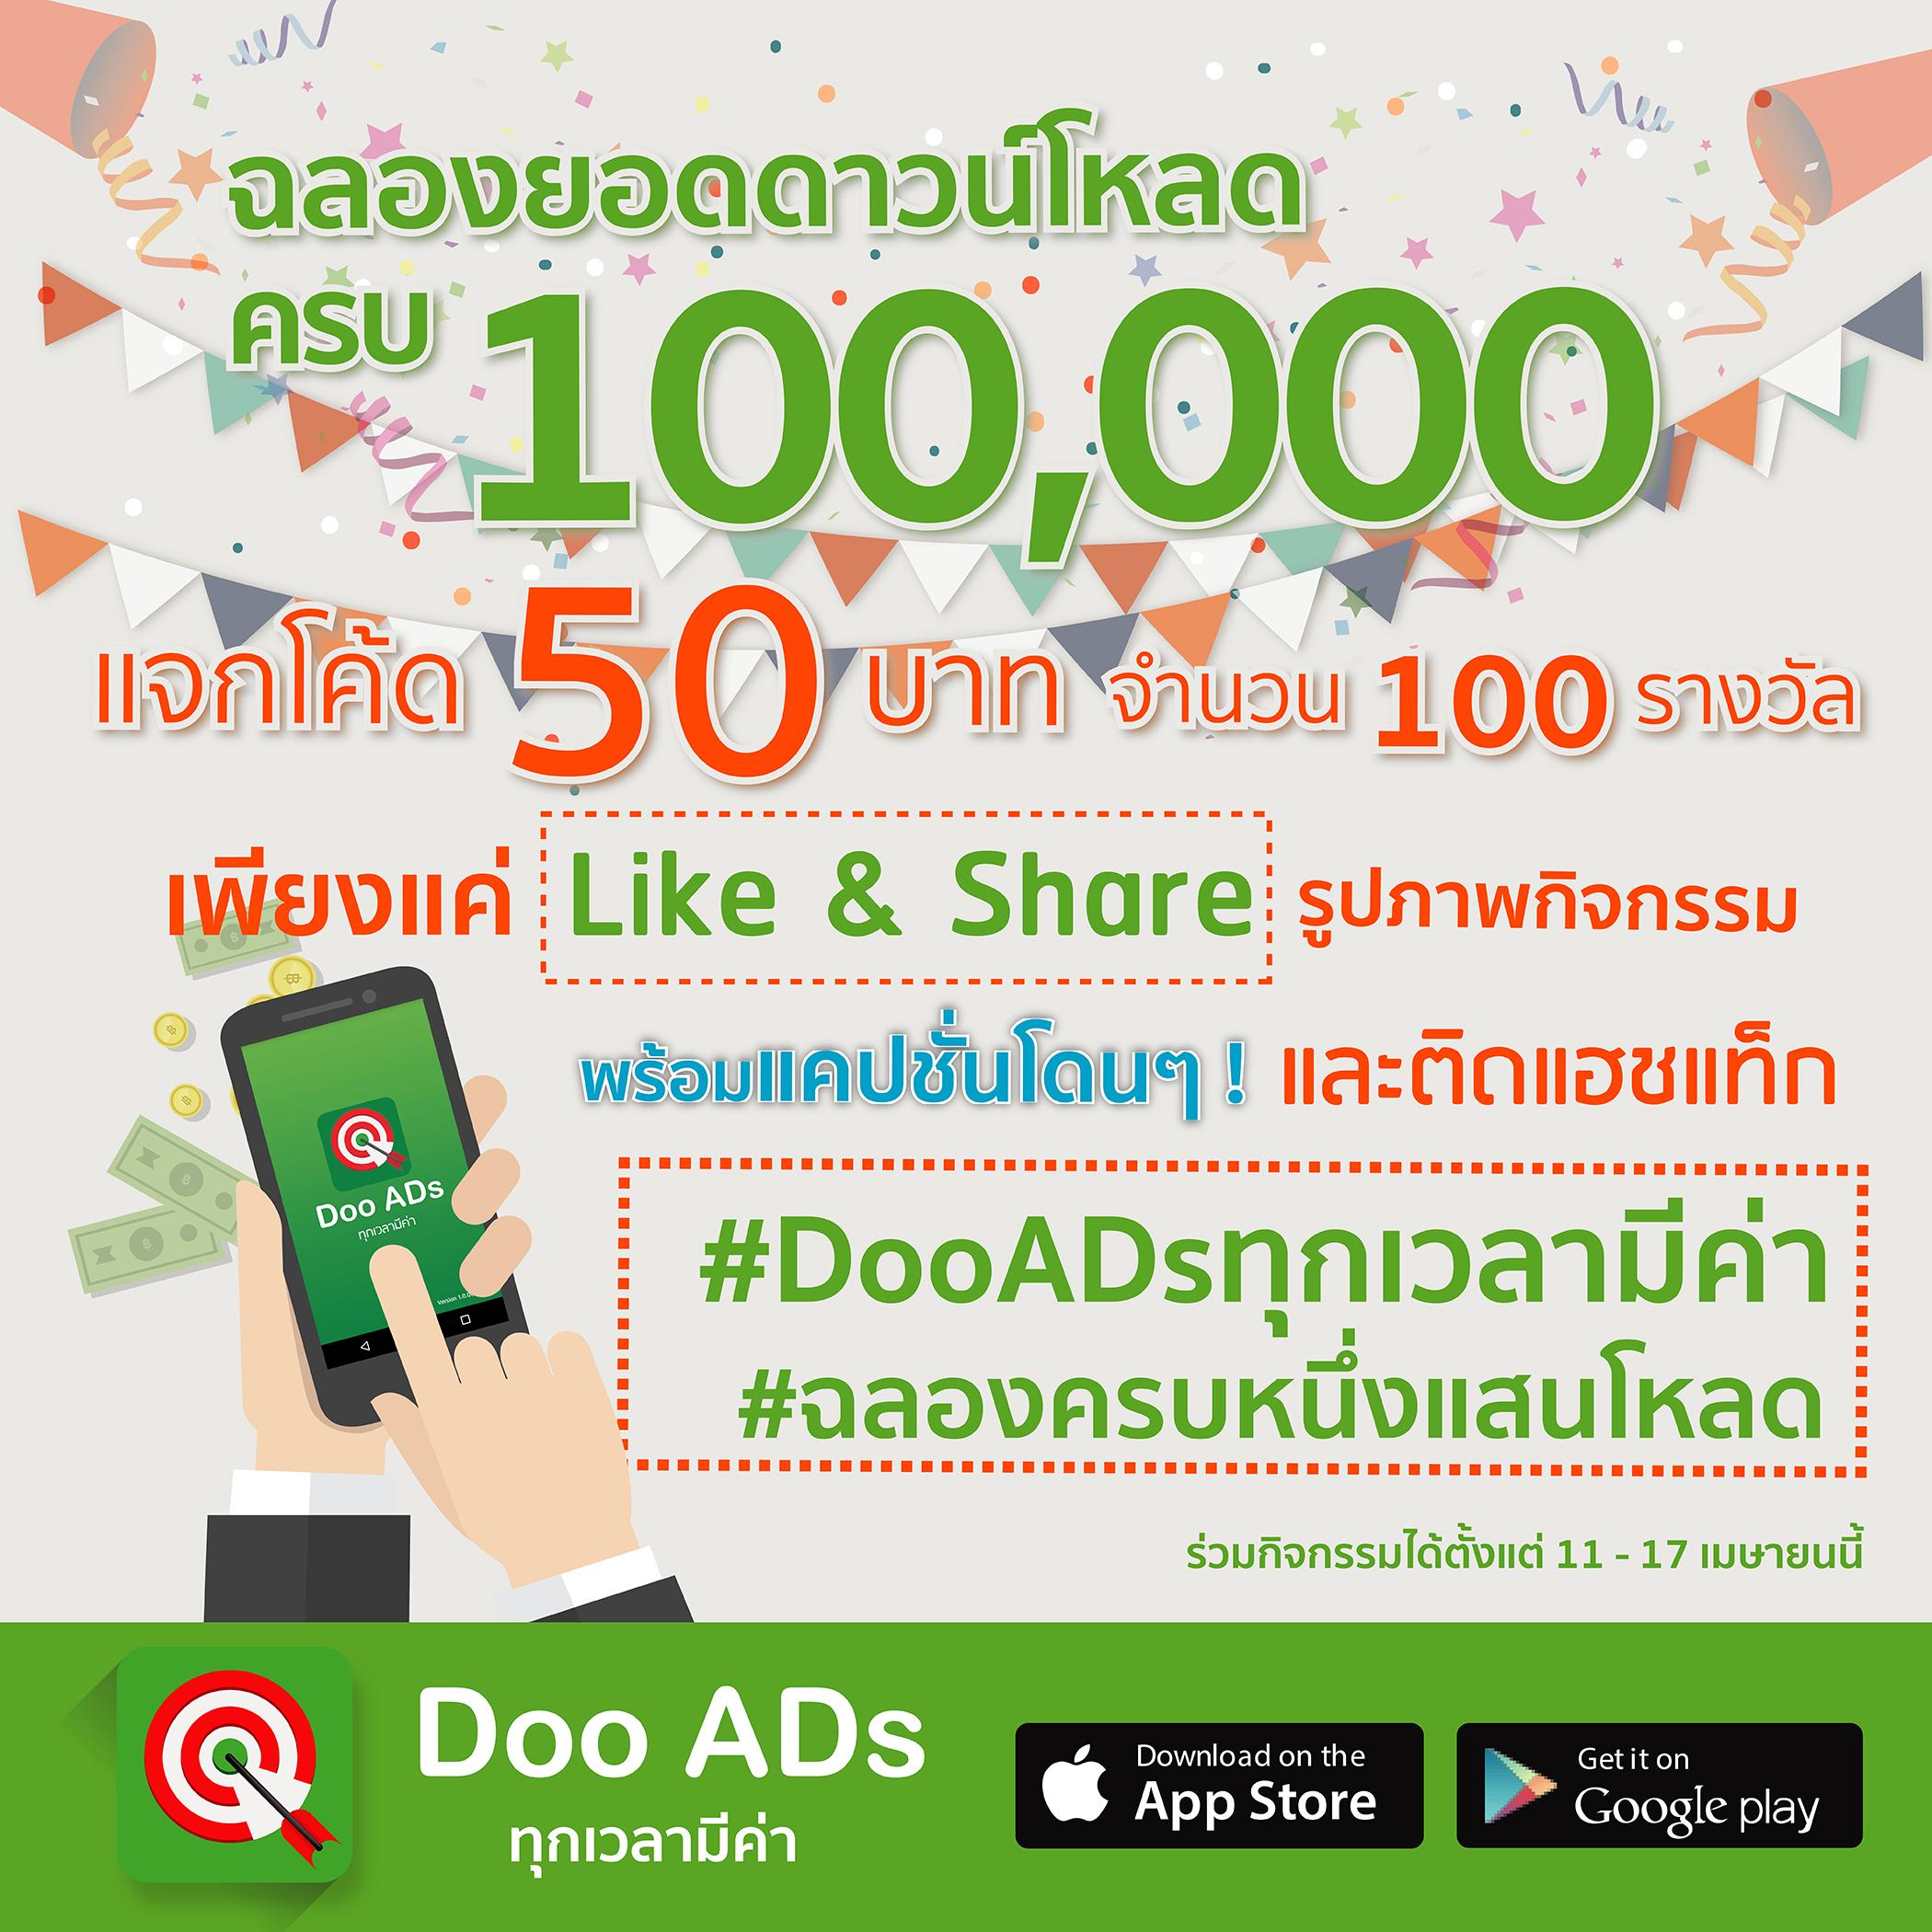 Doo ADs